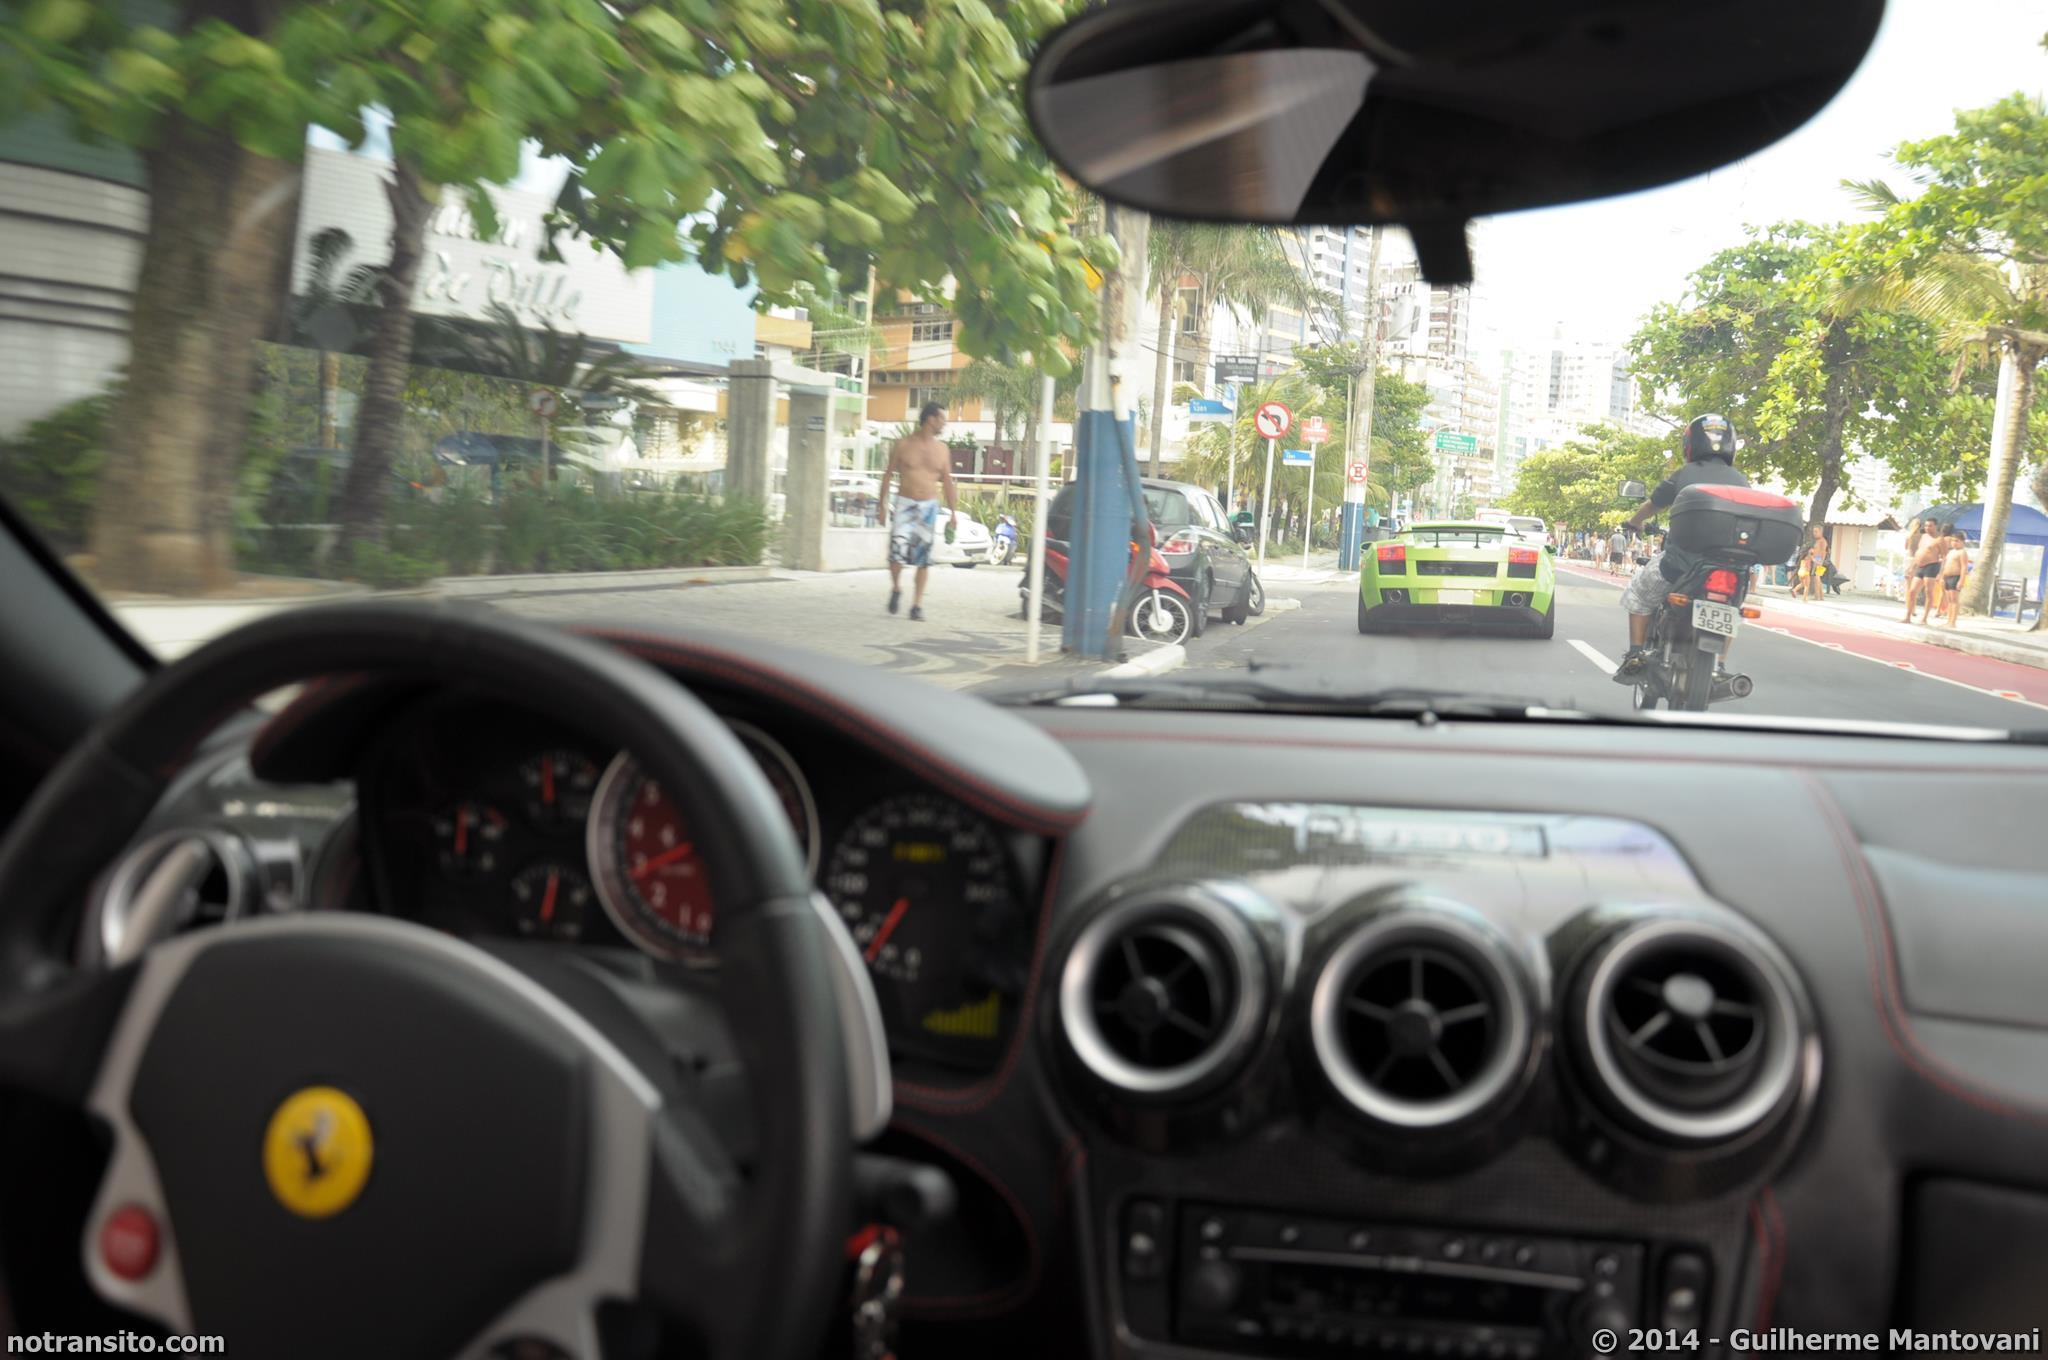 Ferrari F430 Coupe White, Meia Praia Itapema